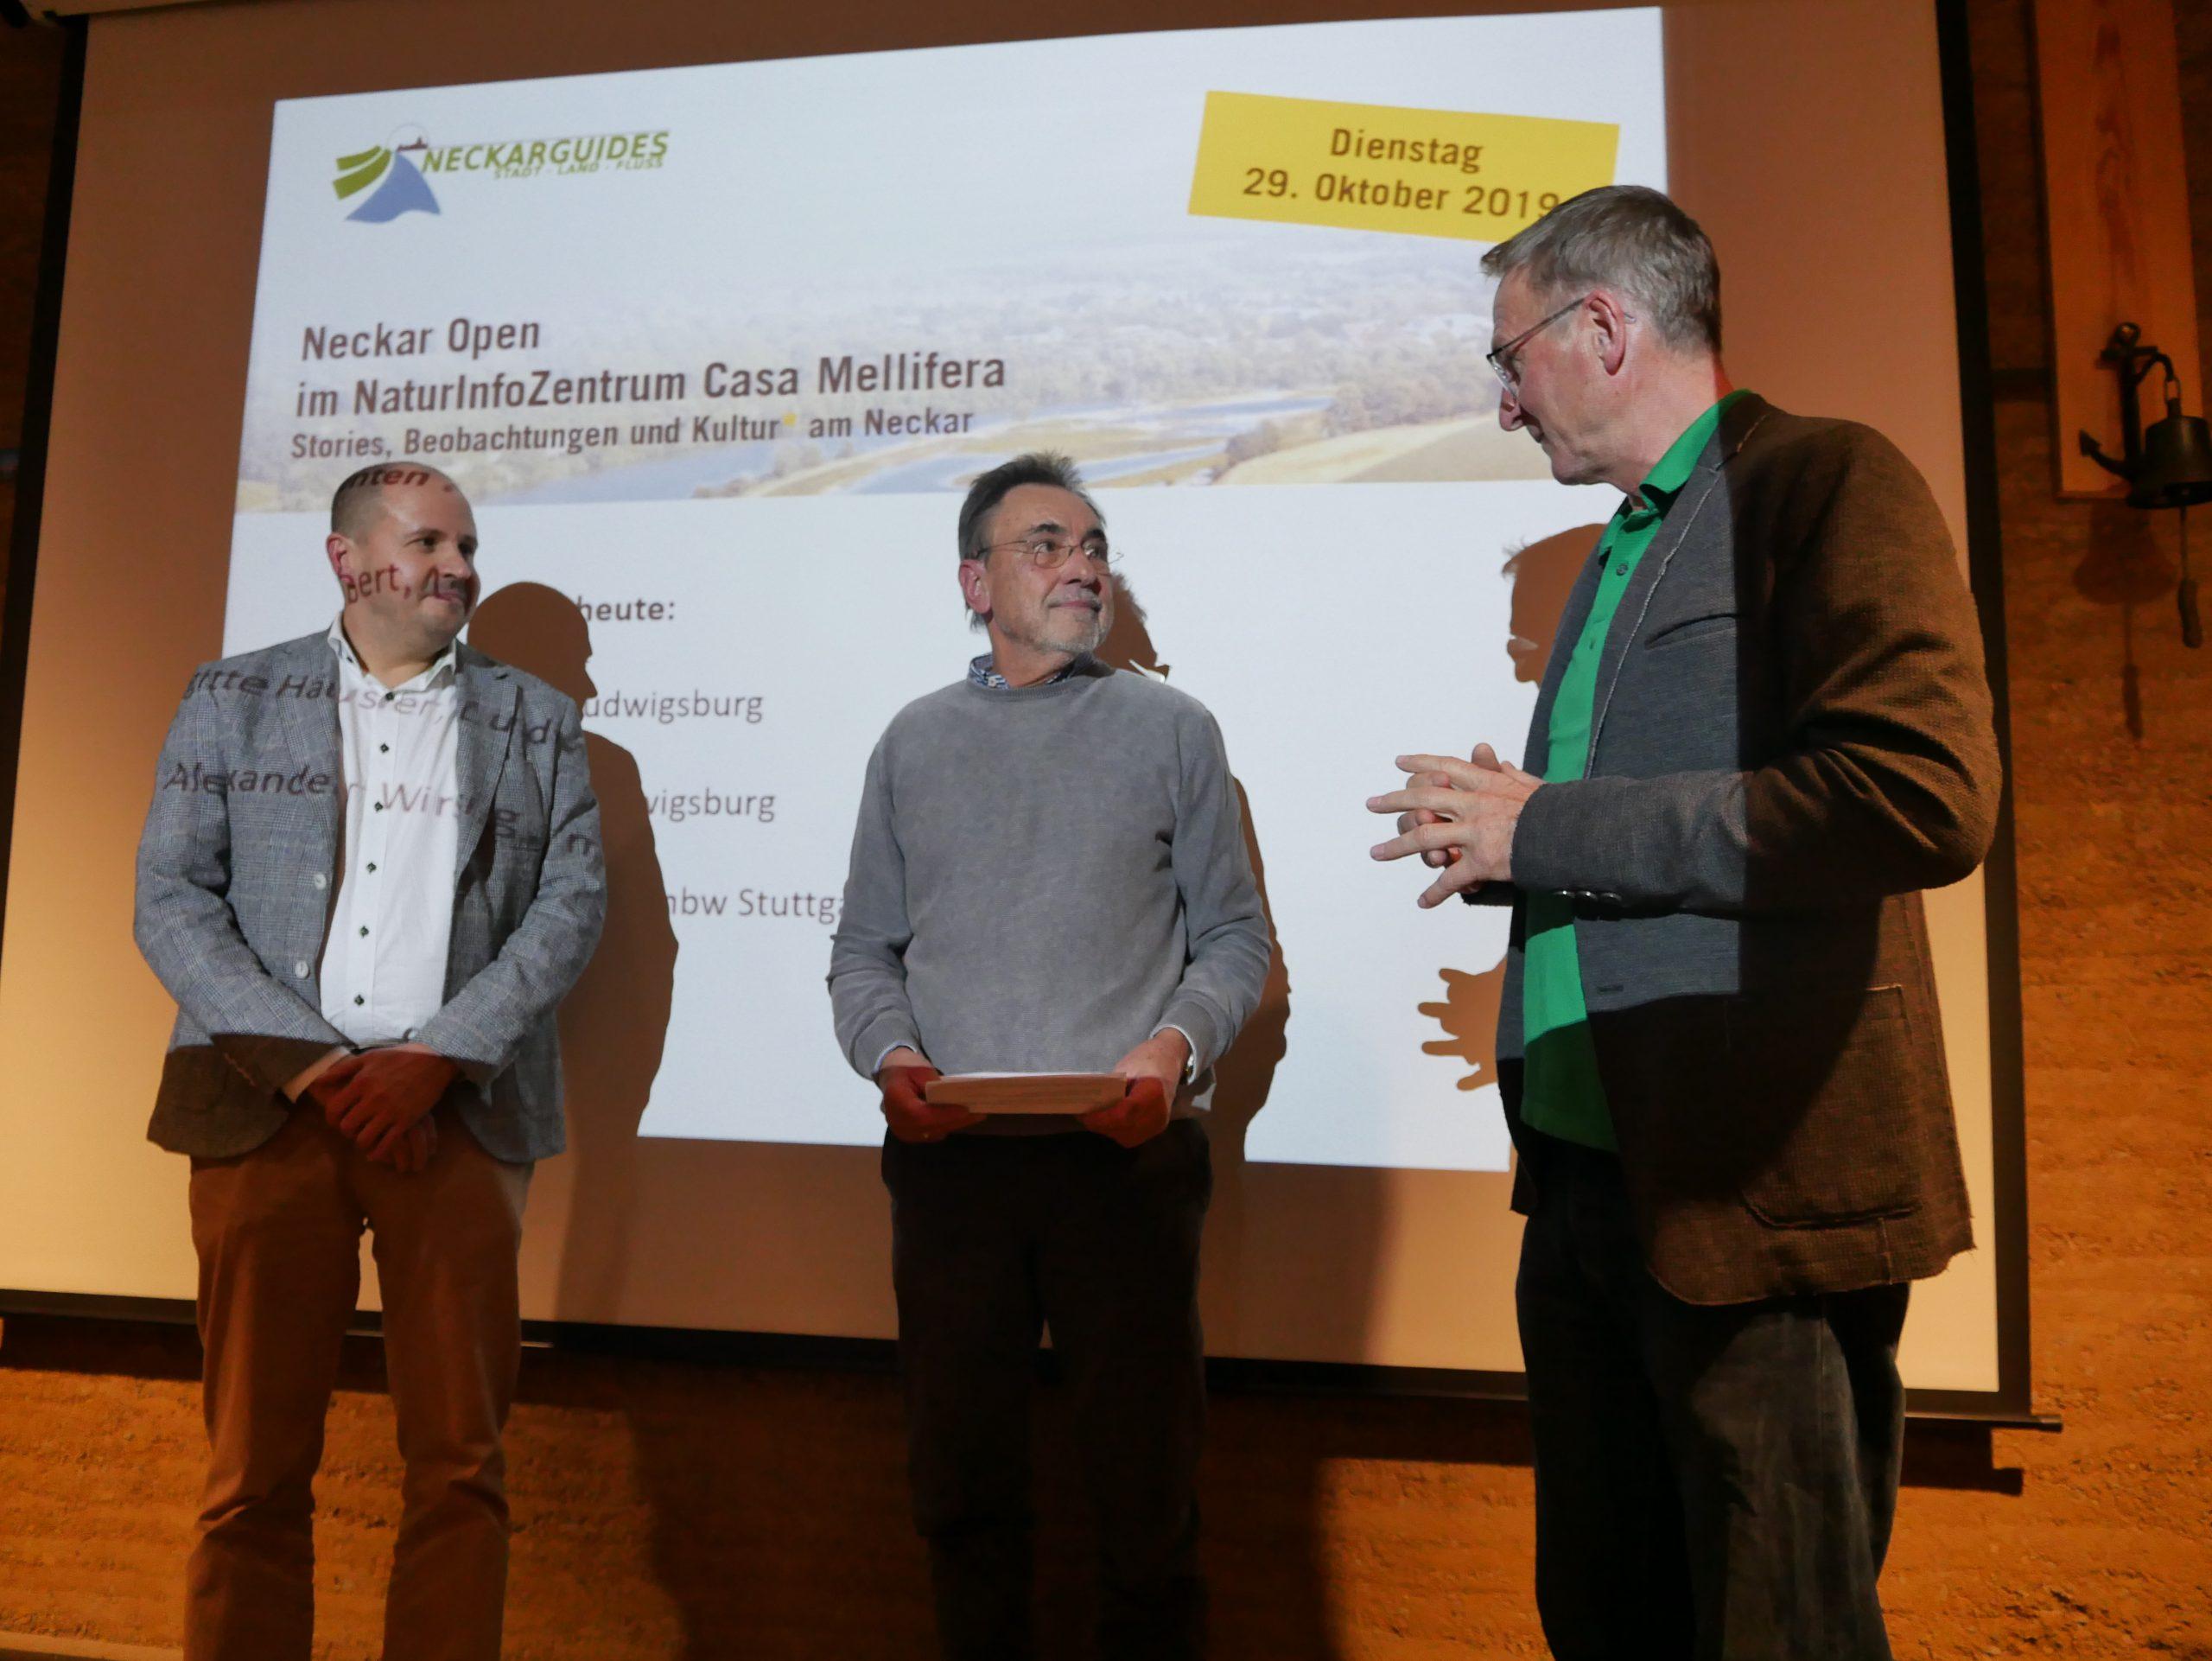 Neckar Open 16